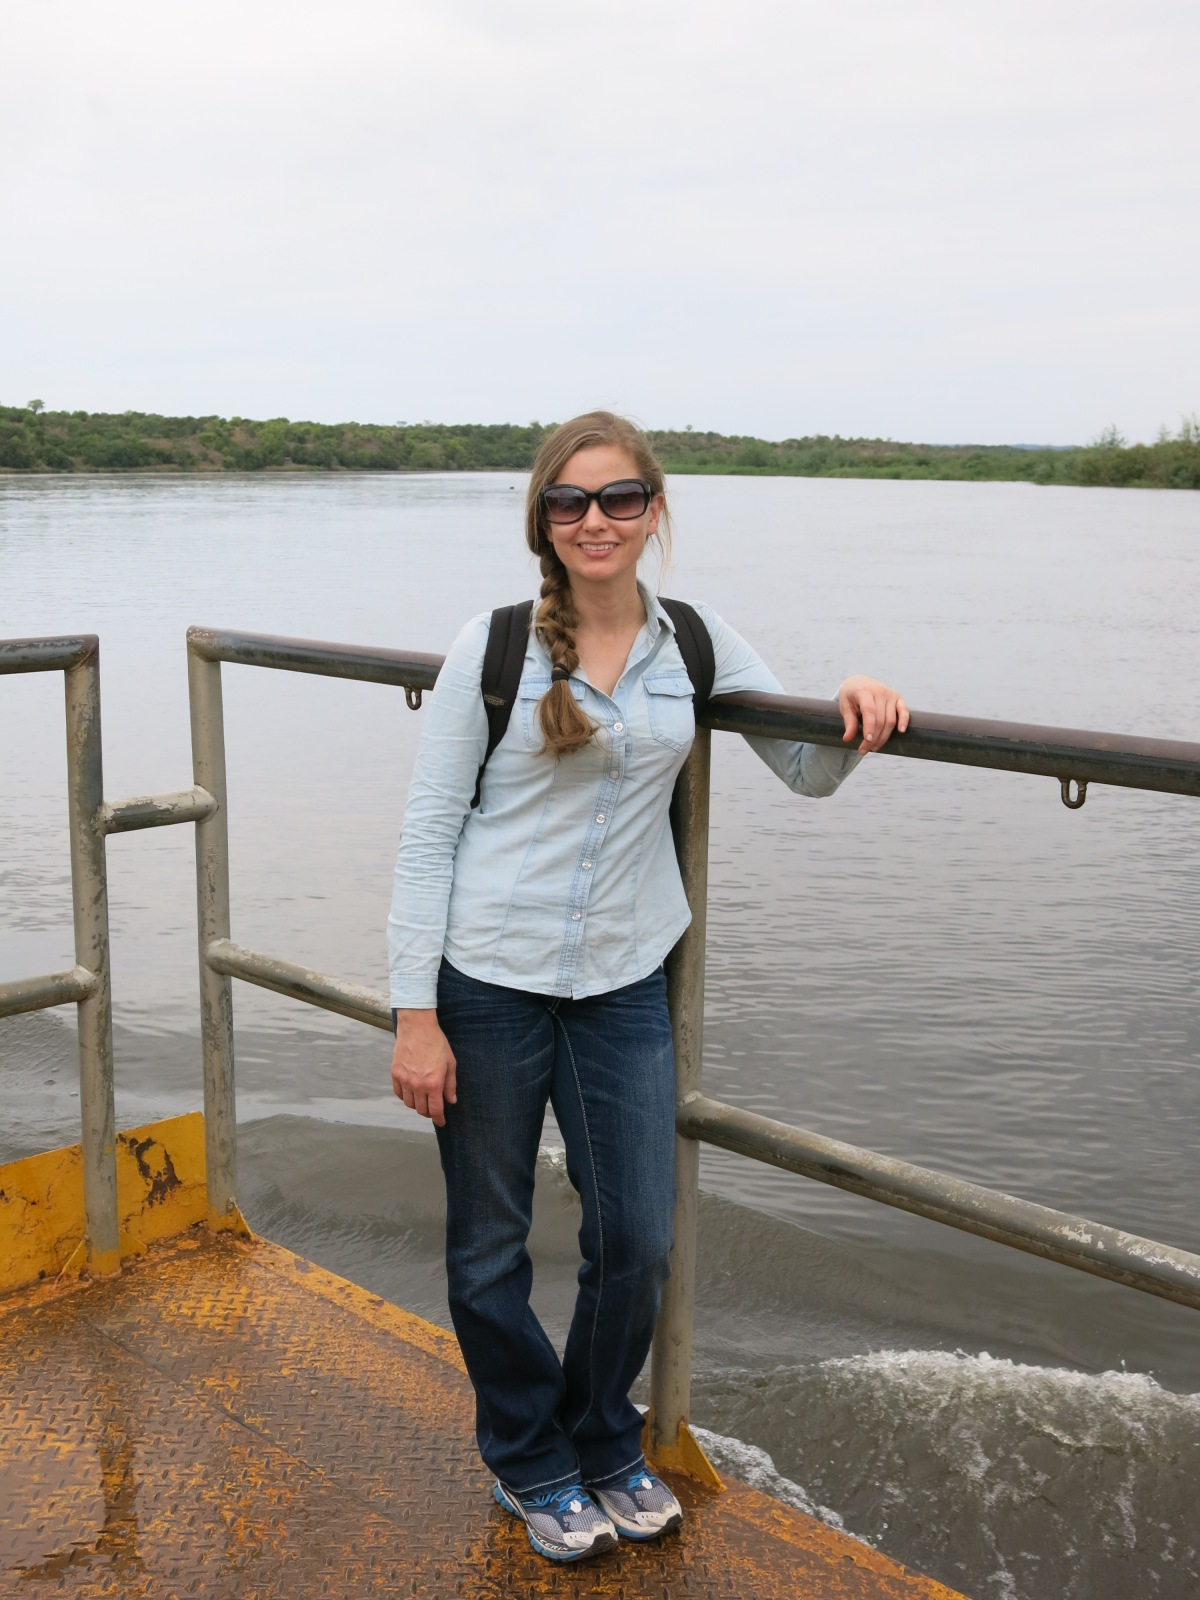 Crossing Nile to Paraa Safari Lodge in Murchison Falls National Park